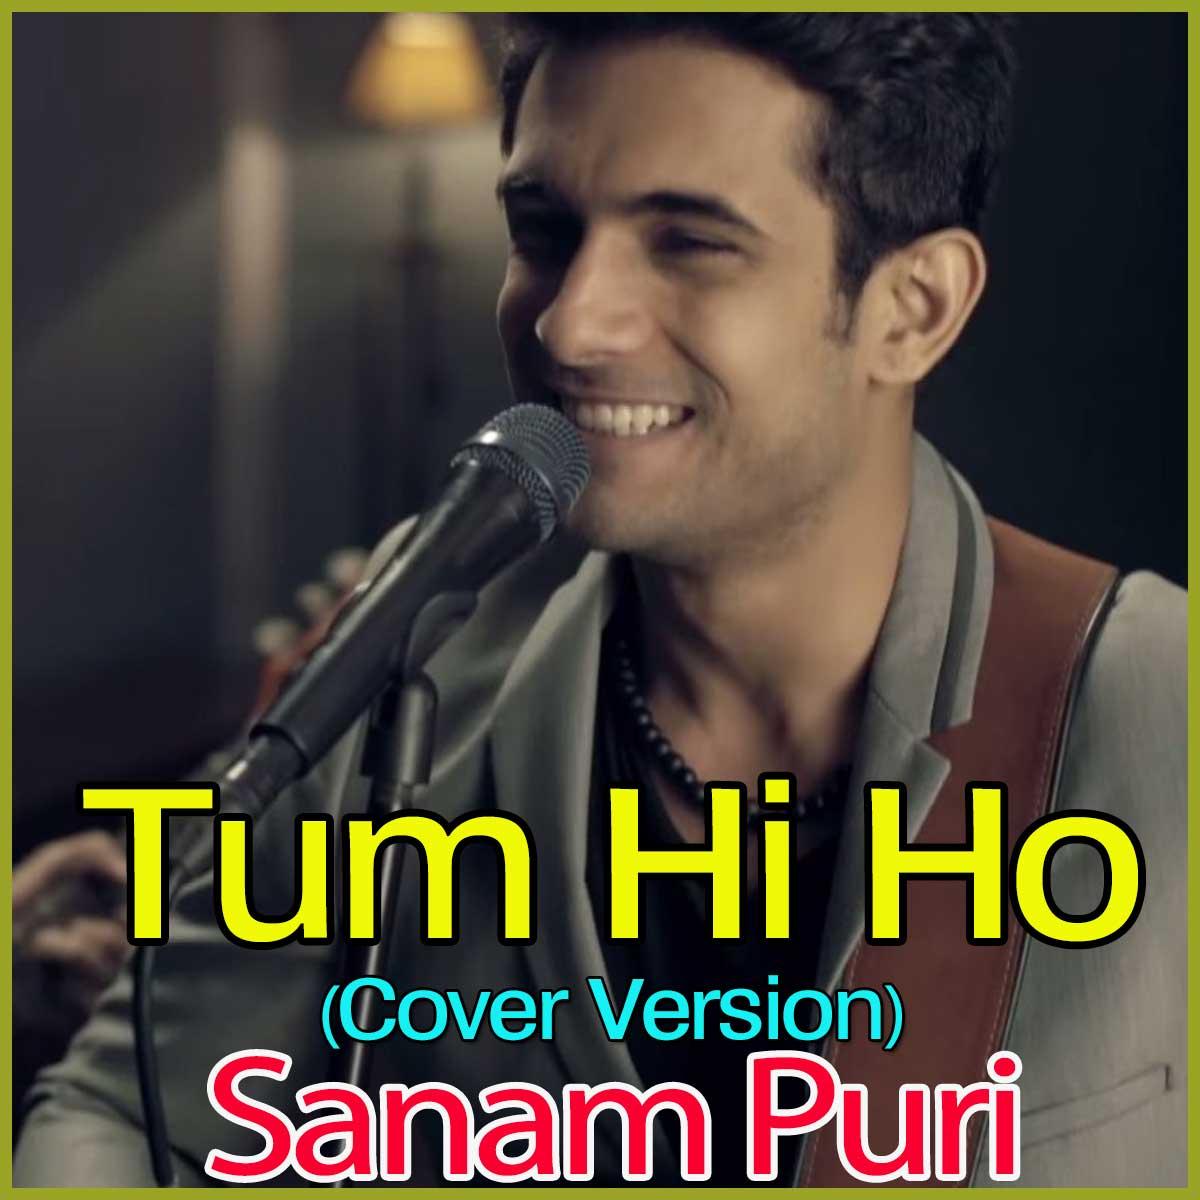 Raw star 2014 tum hi ho soul version by darshan raval youtube.